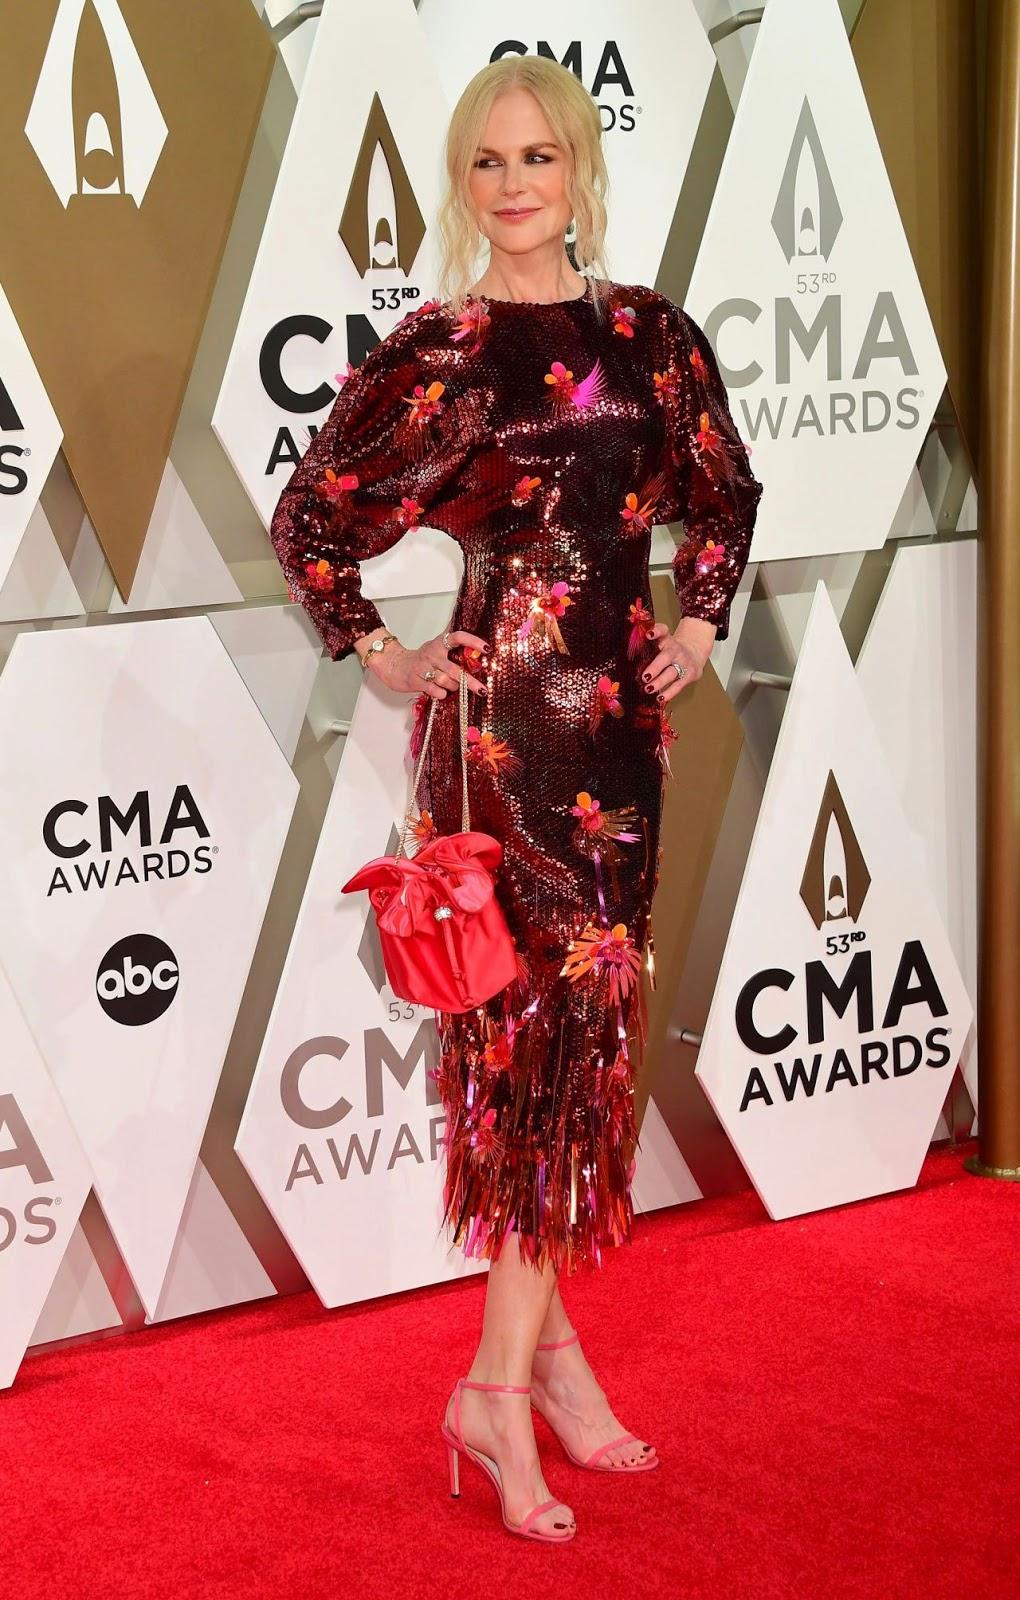 Nicole Kidman – 53rd Annual CMA Awards at Bridgestone Arena in Nashville